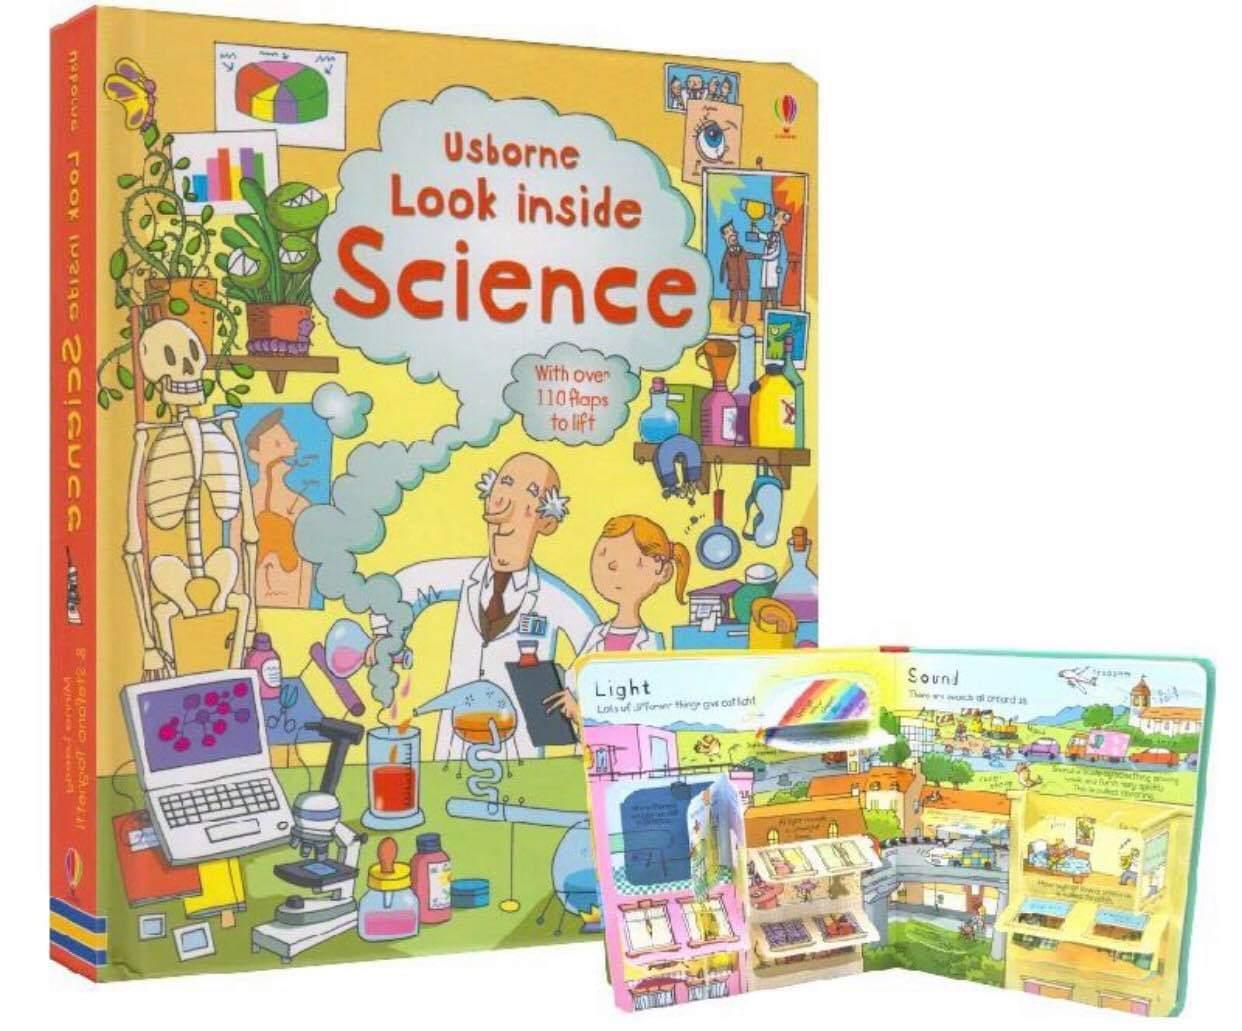 Usborne English Childrens 3d Picture Usborne Look Inside Science.